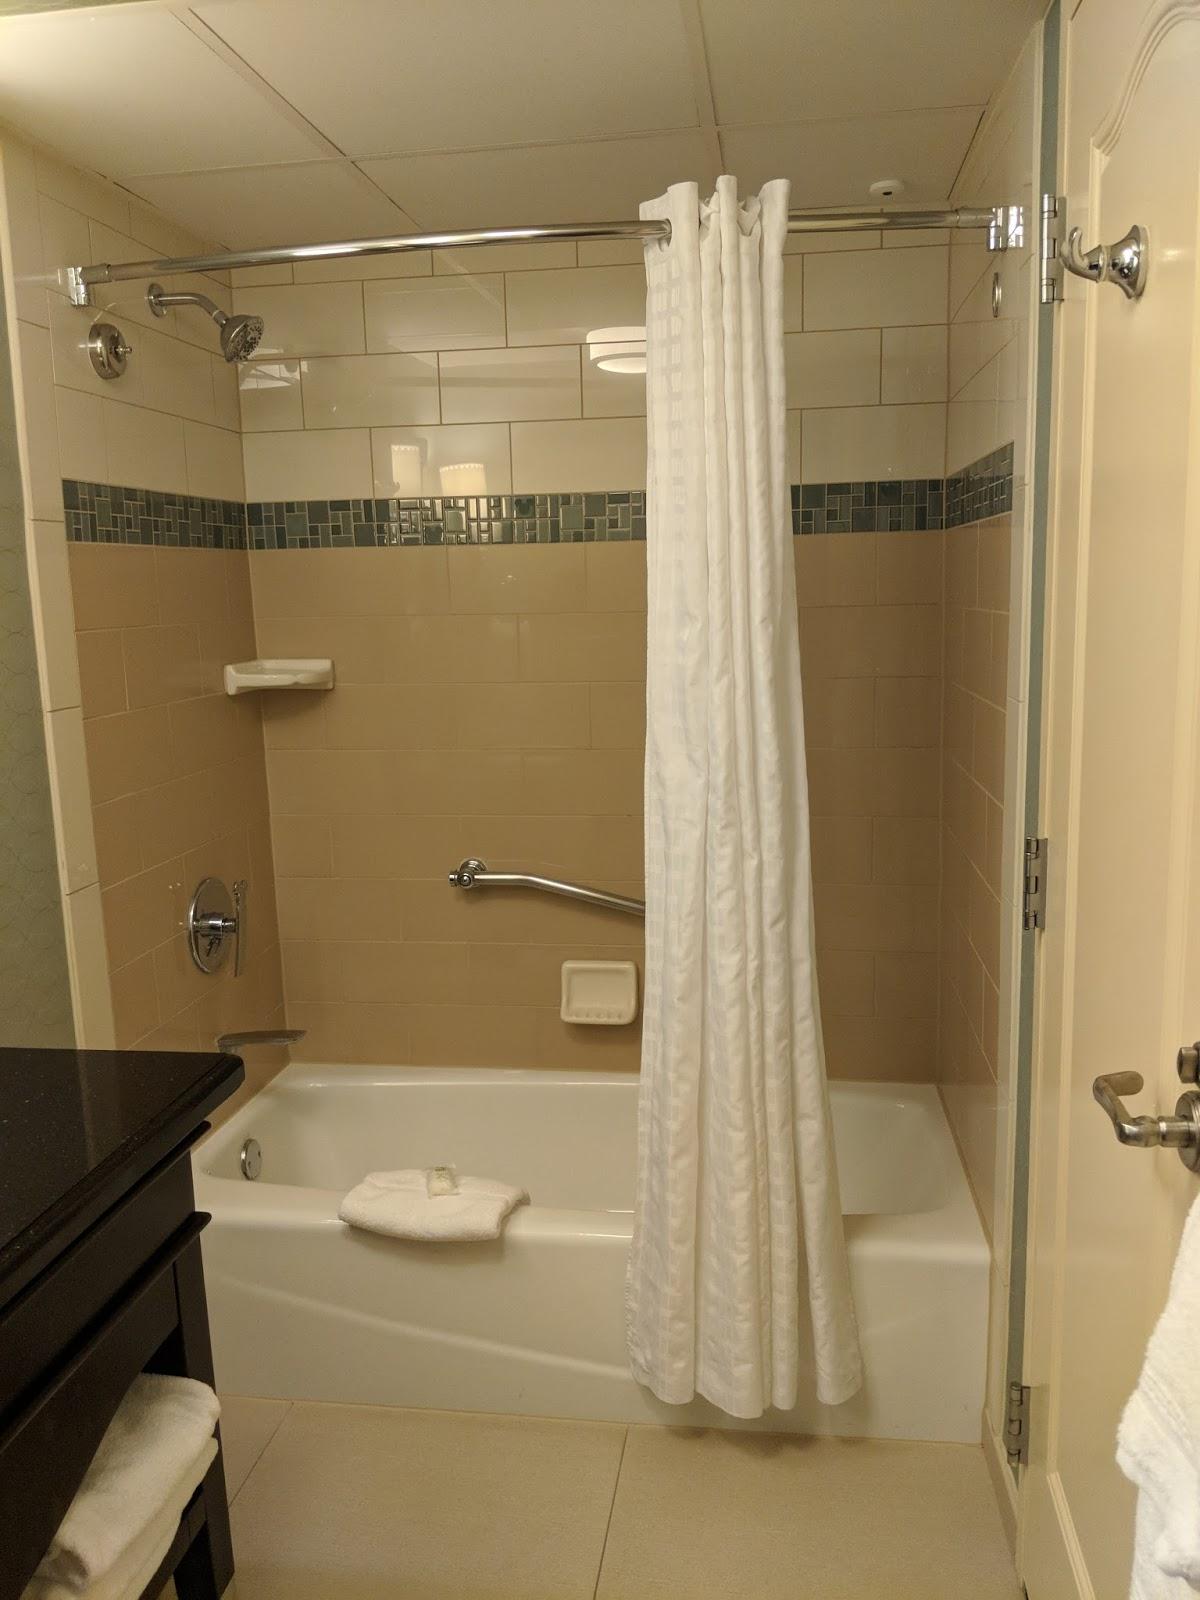 anaheim hotels with kitchen near disneyland bronze faucets review hotel